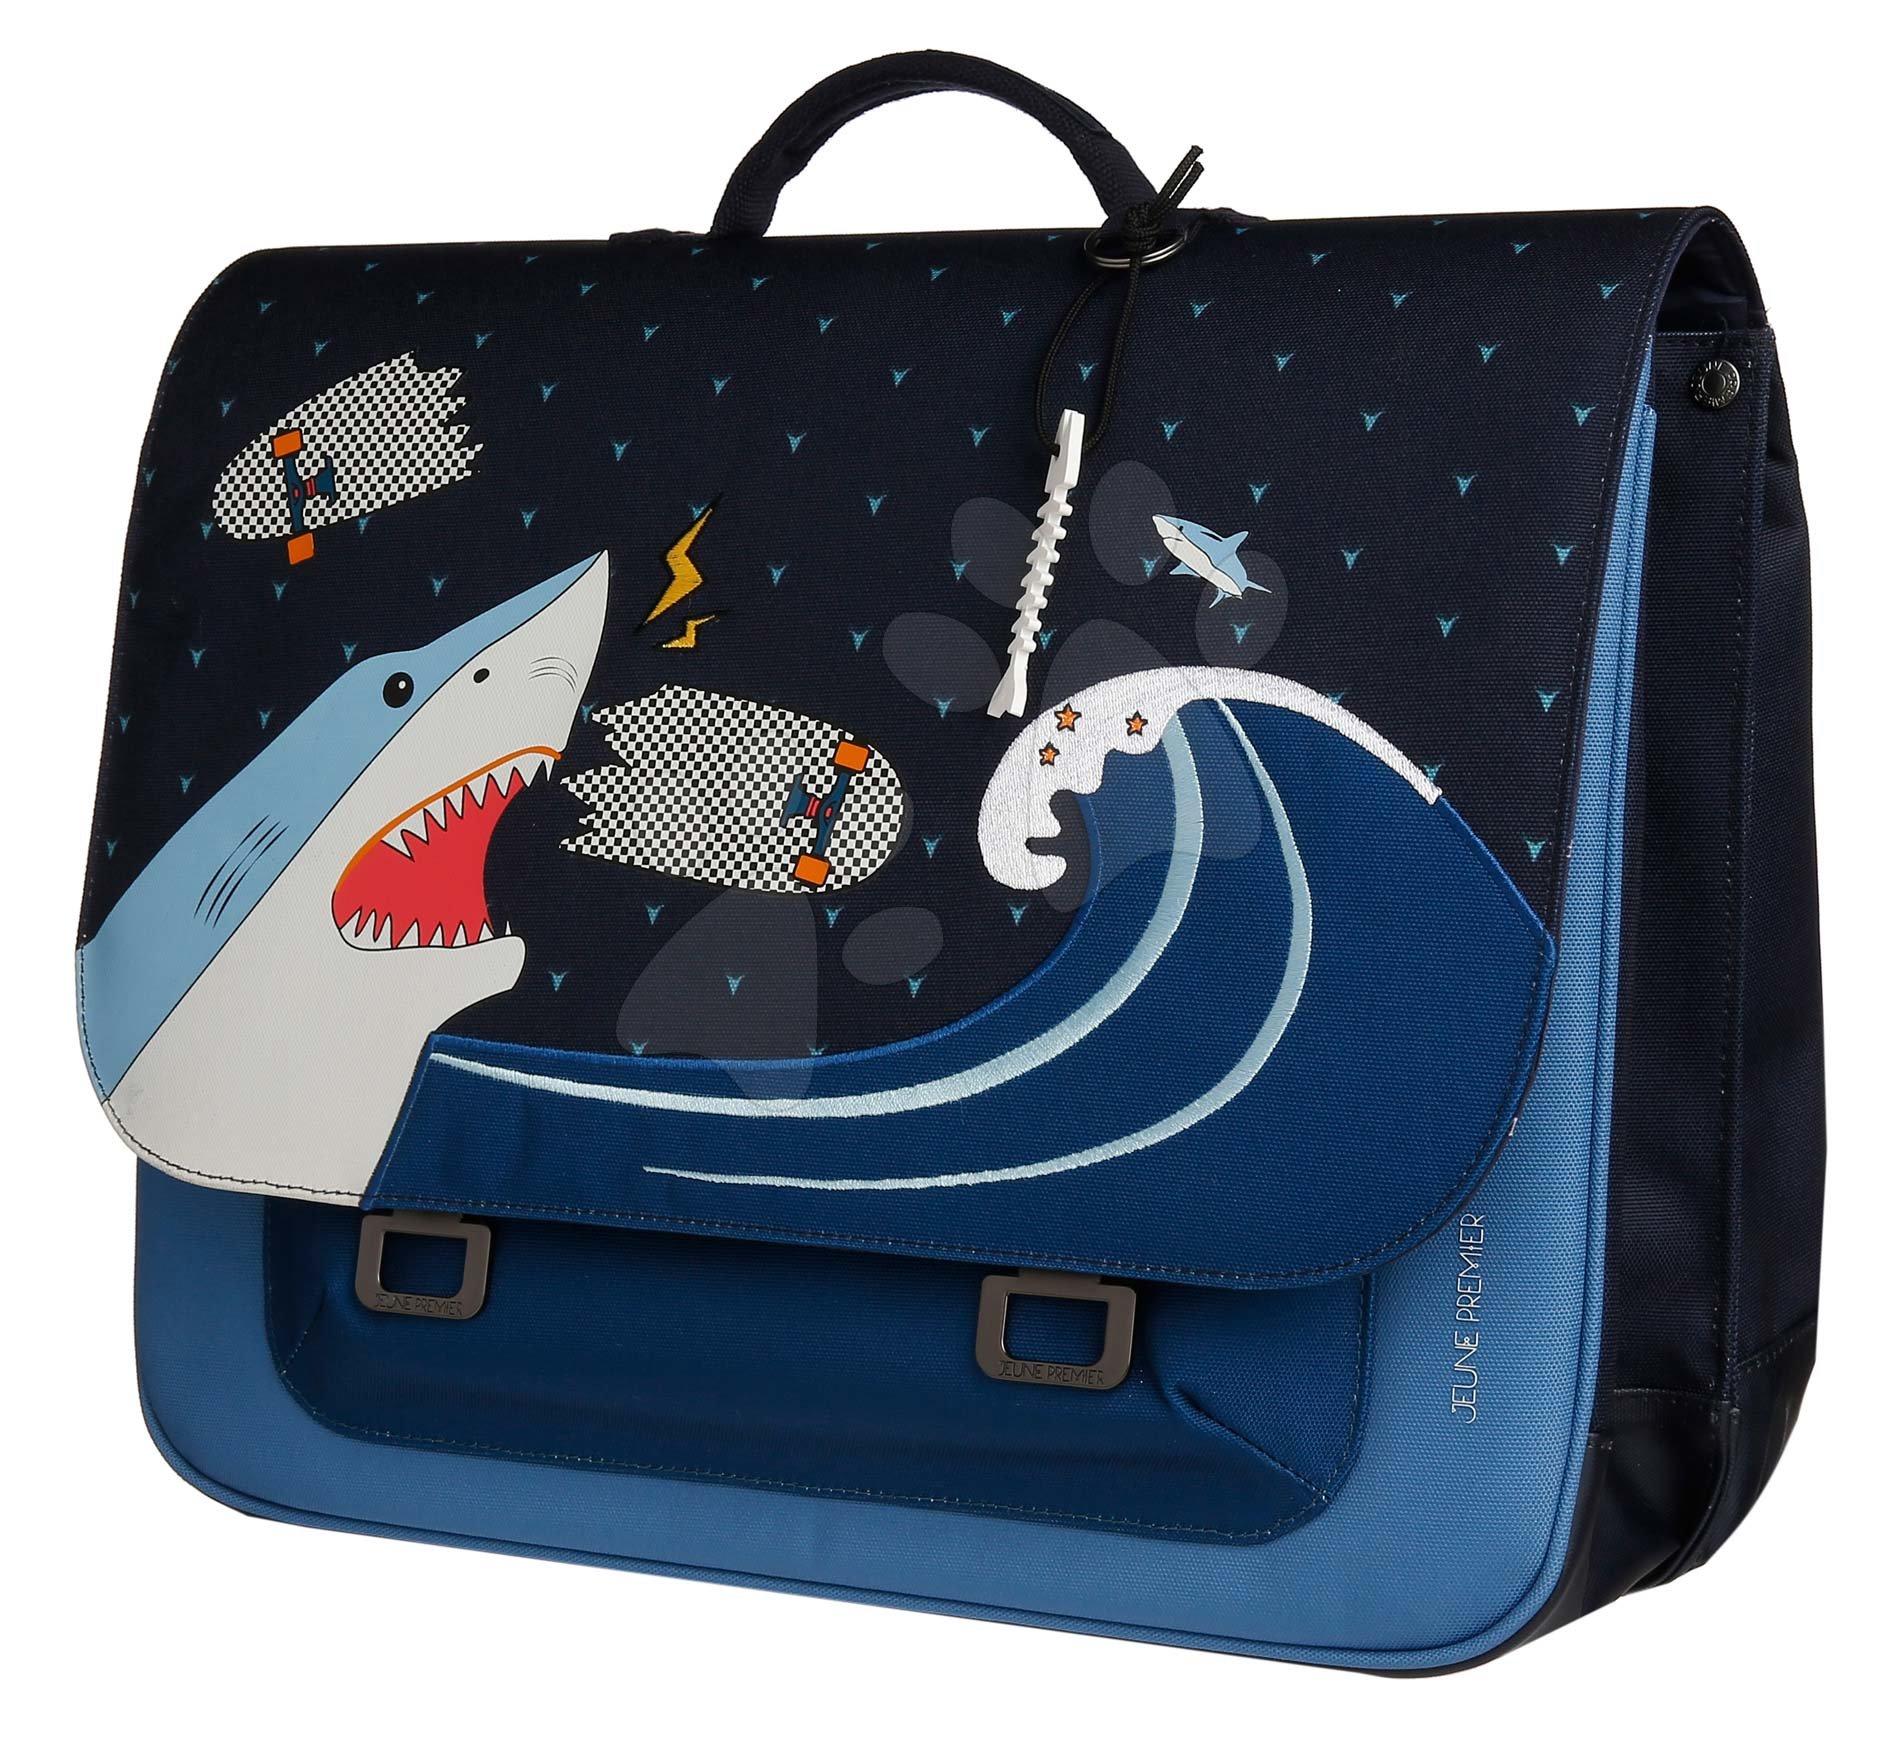 Školská aktovka It bag Maxi Sharkie Jeune Premier ergonomická luxusné prevedenie 35*41 cm